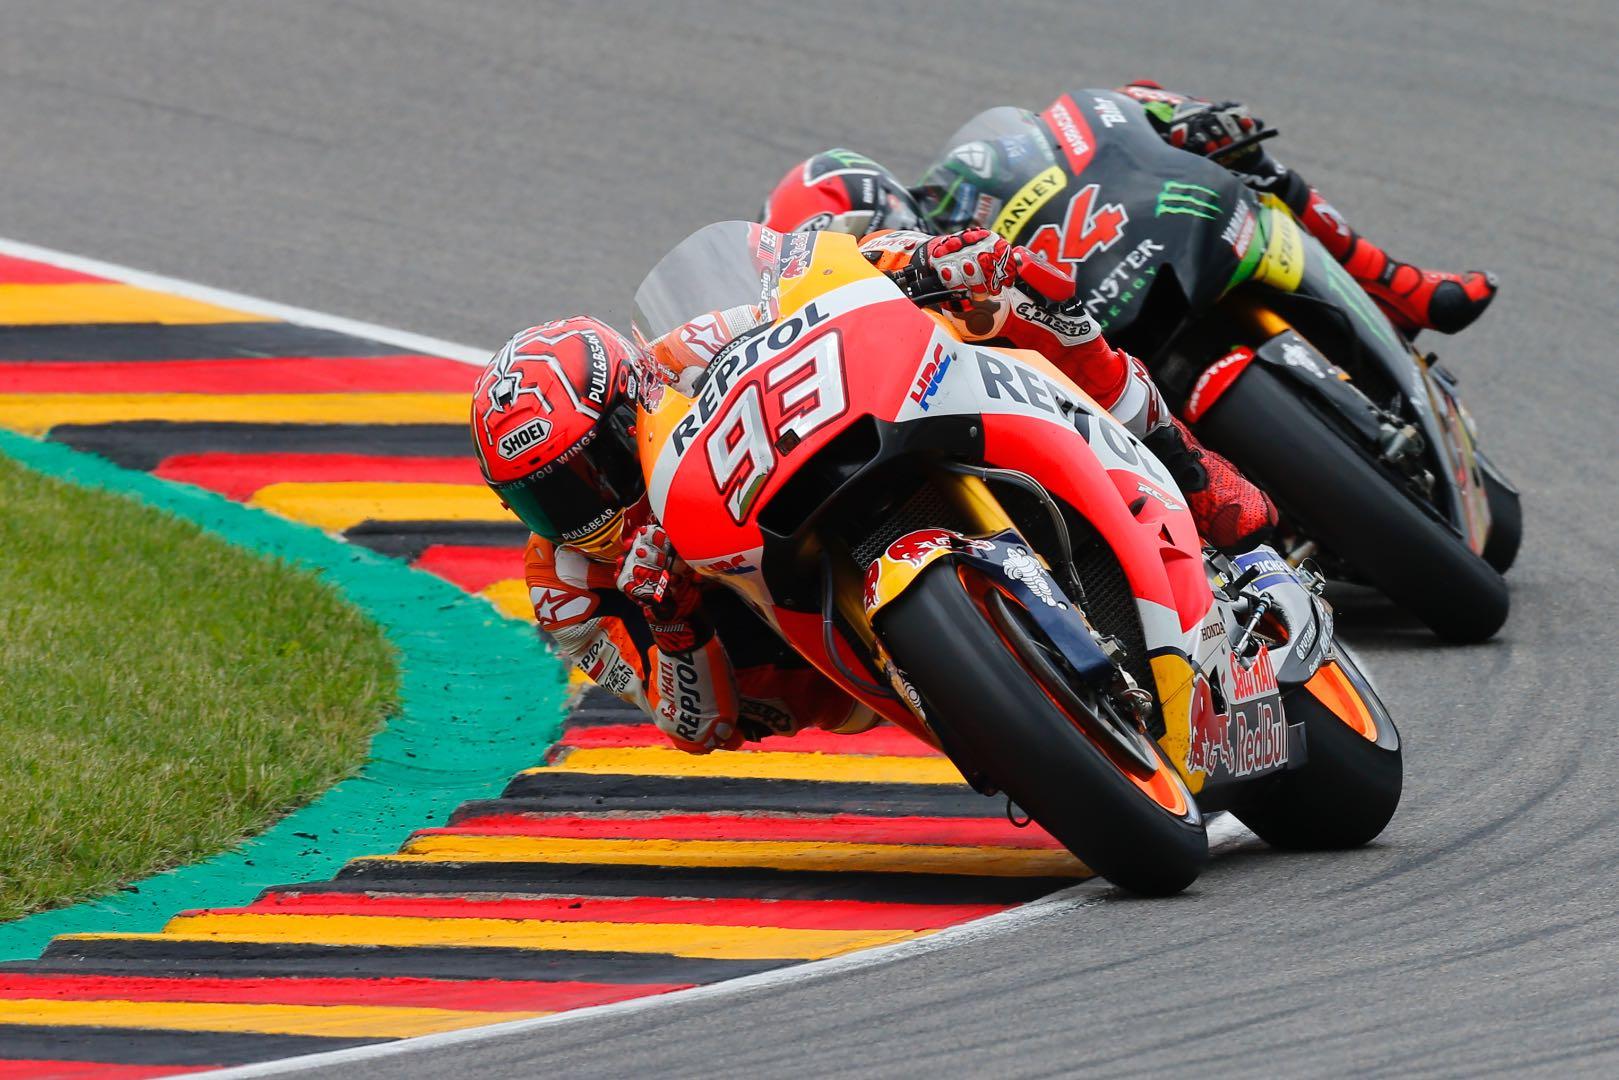 2017 Sachsenring MotoGP Results: Germany Grand Prix Results: Honda's Marc Marquez